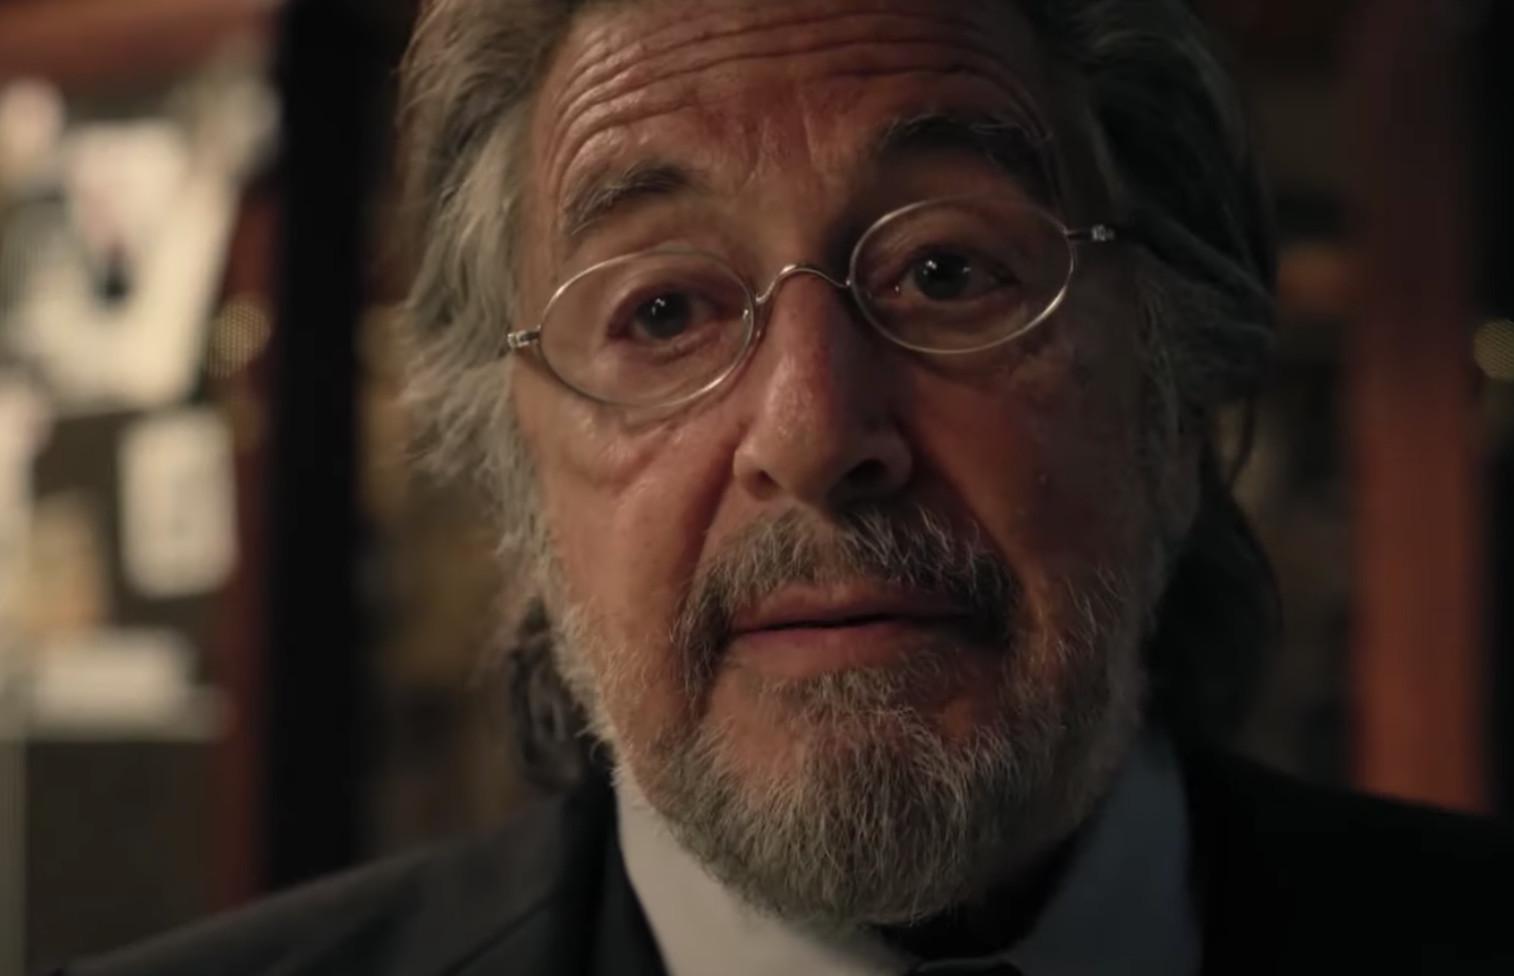 Amazon Drops Teaser for Jordan Peele's Nazi-Hunting Thriller 'Hunters' Starring Al Pacino